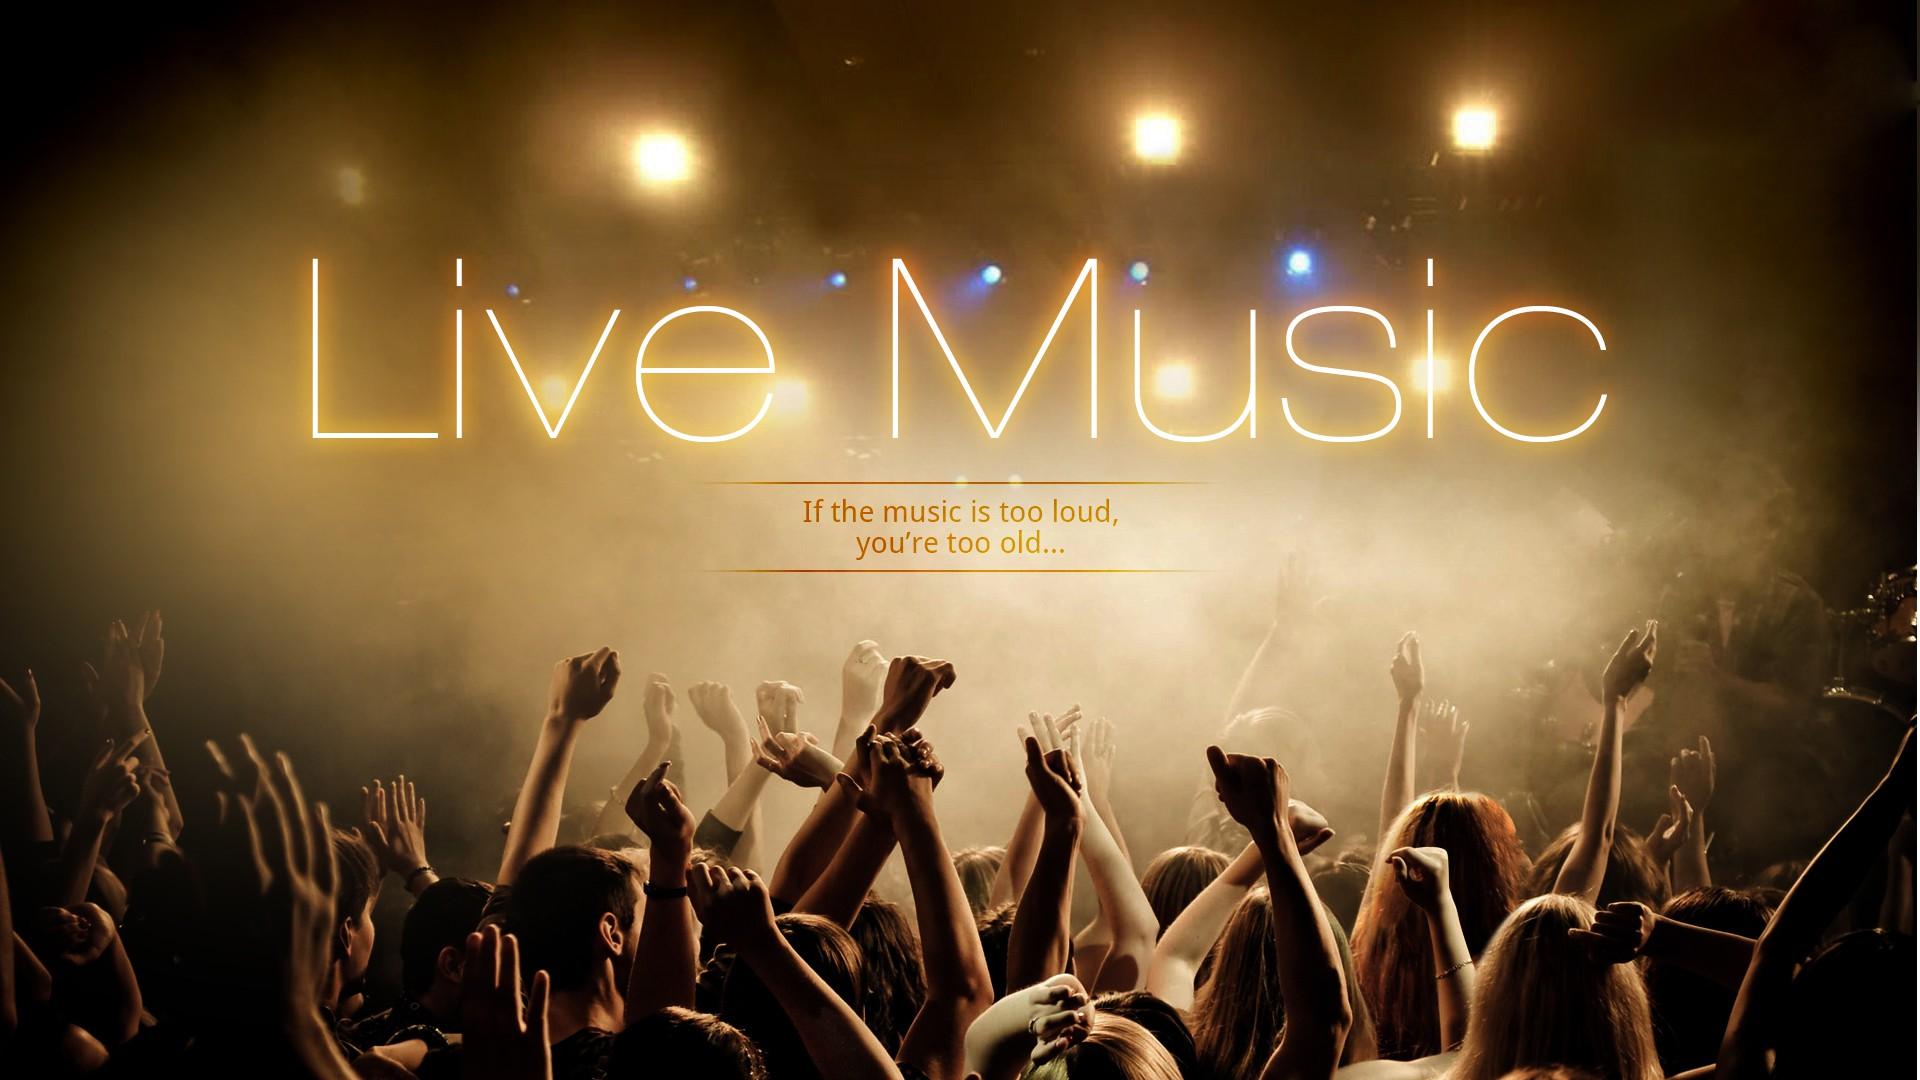 56+] Music Live PC Wallpaper on WallpaperSafari